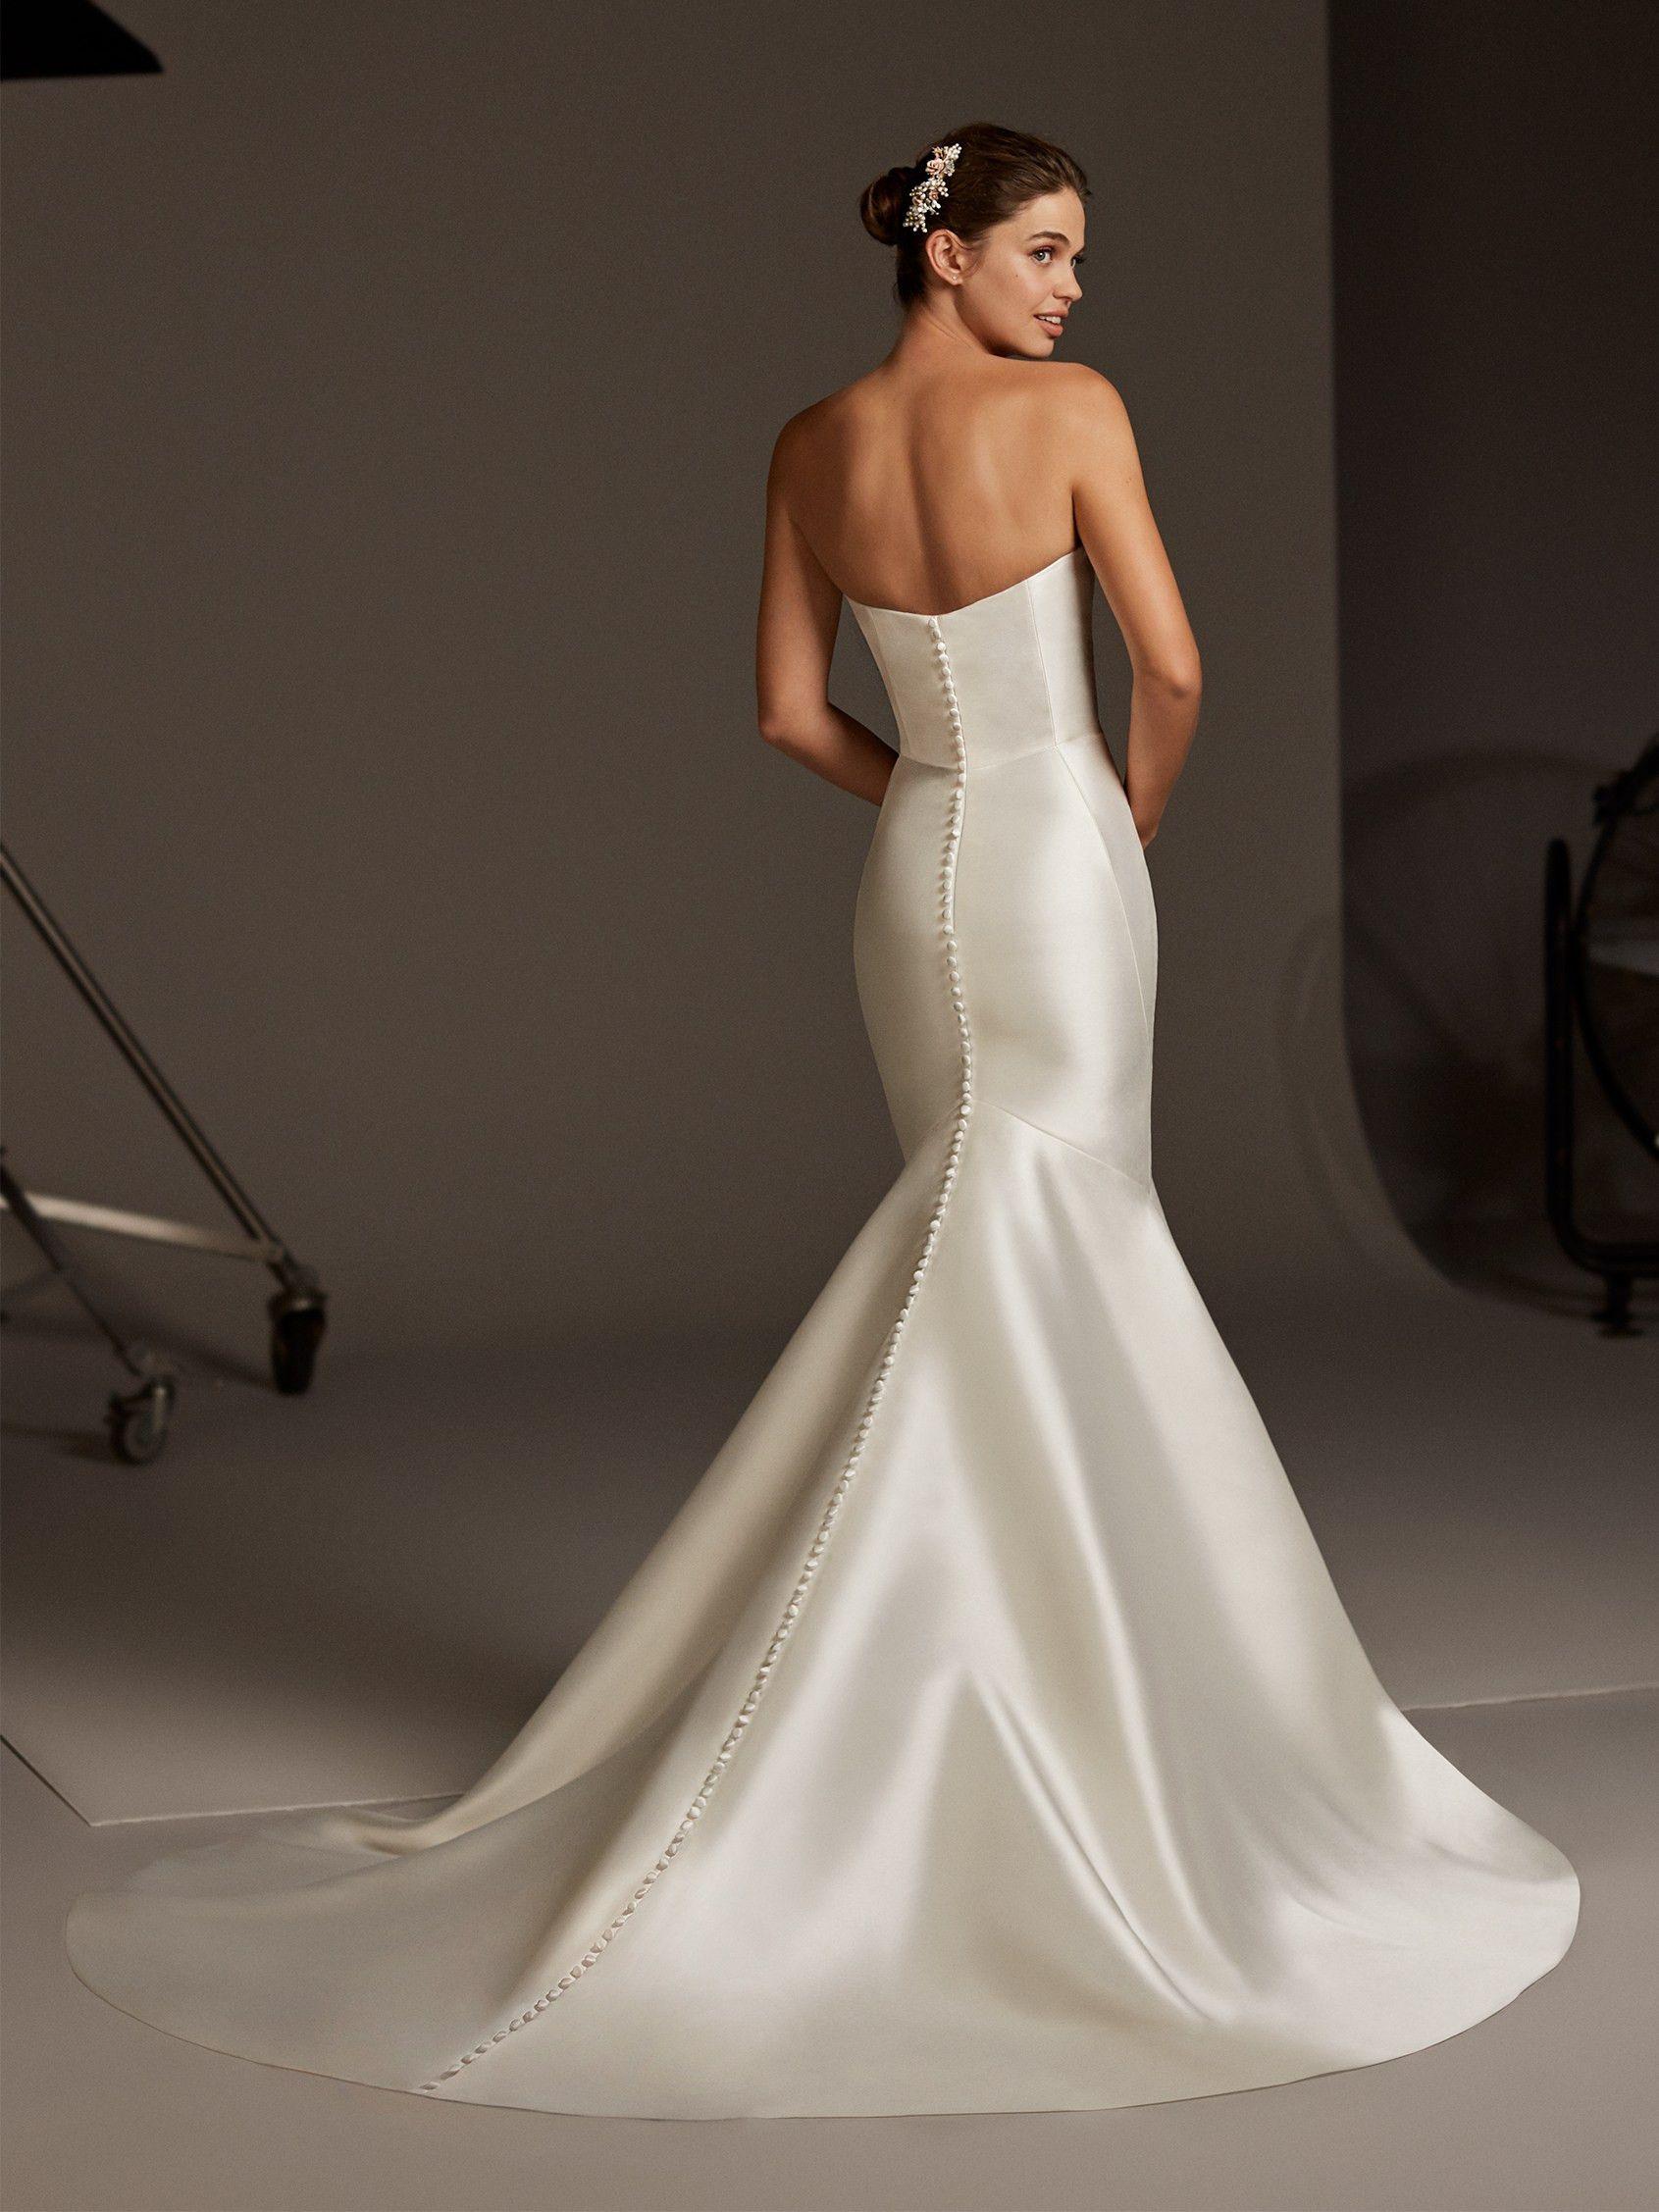 The Oberon Gown By Pronovias Mermaid Wedding Dress Bridal Dresses Pronovias Wedding Dress